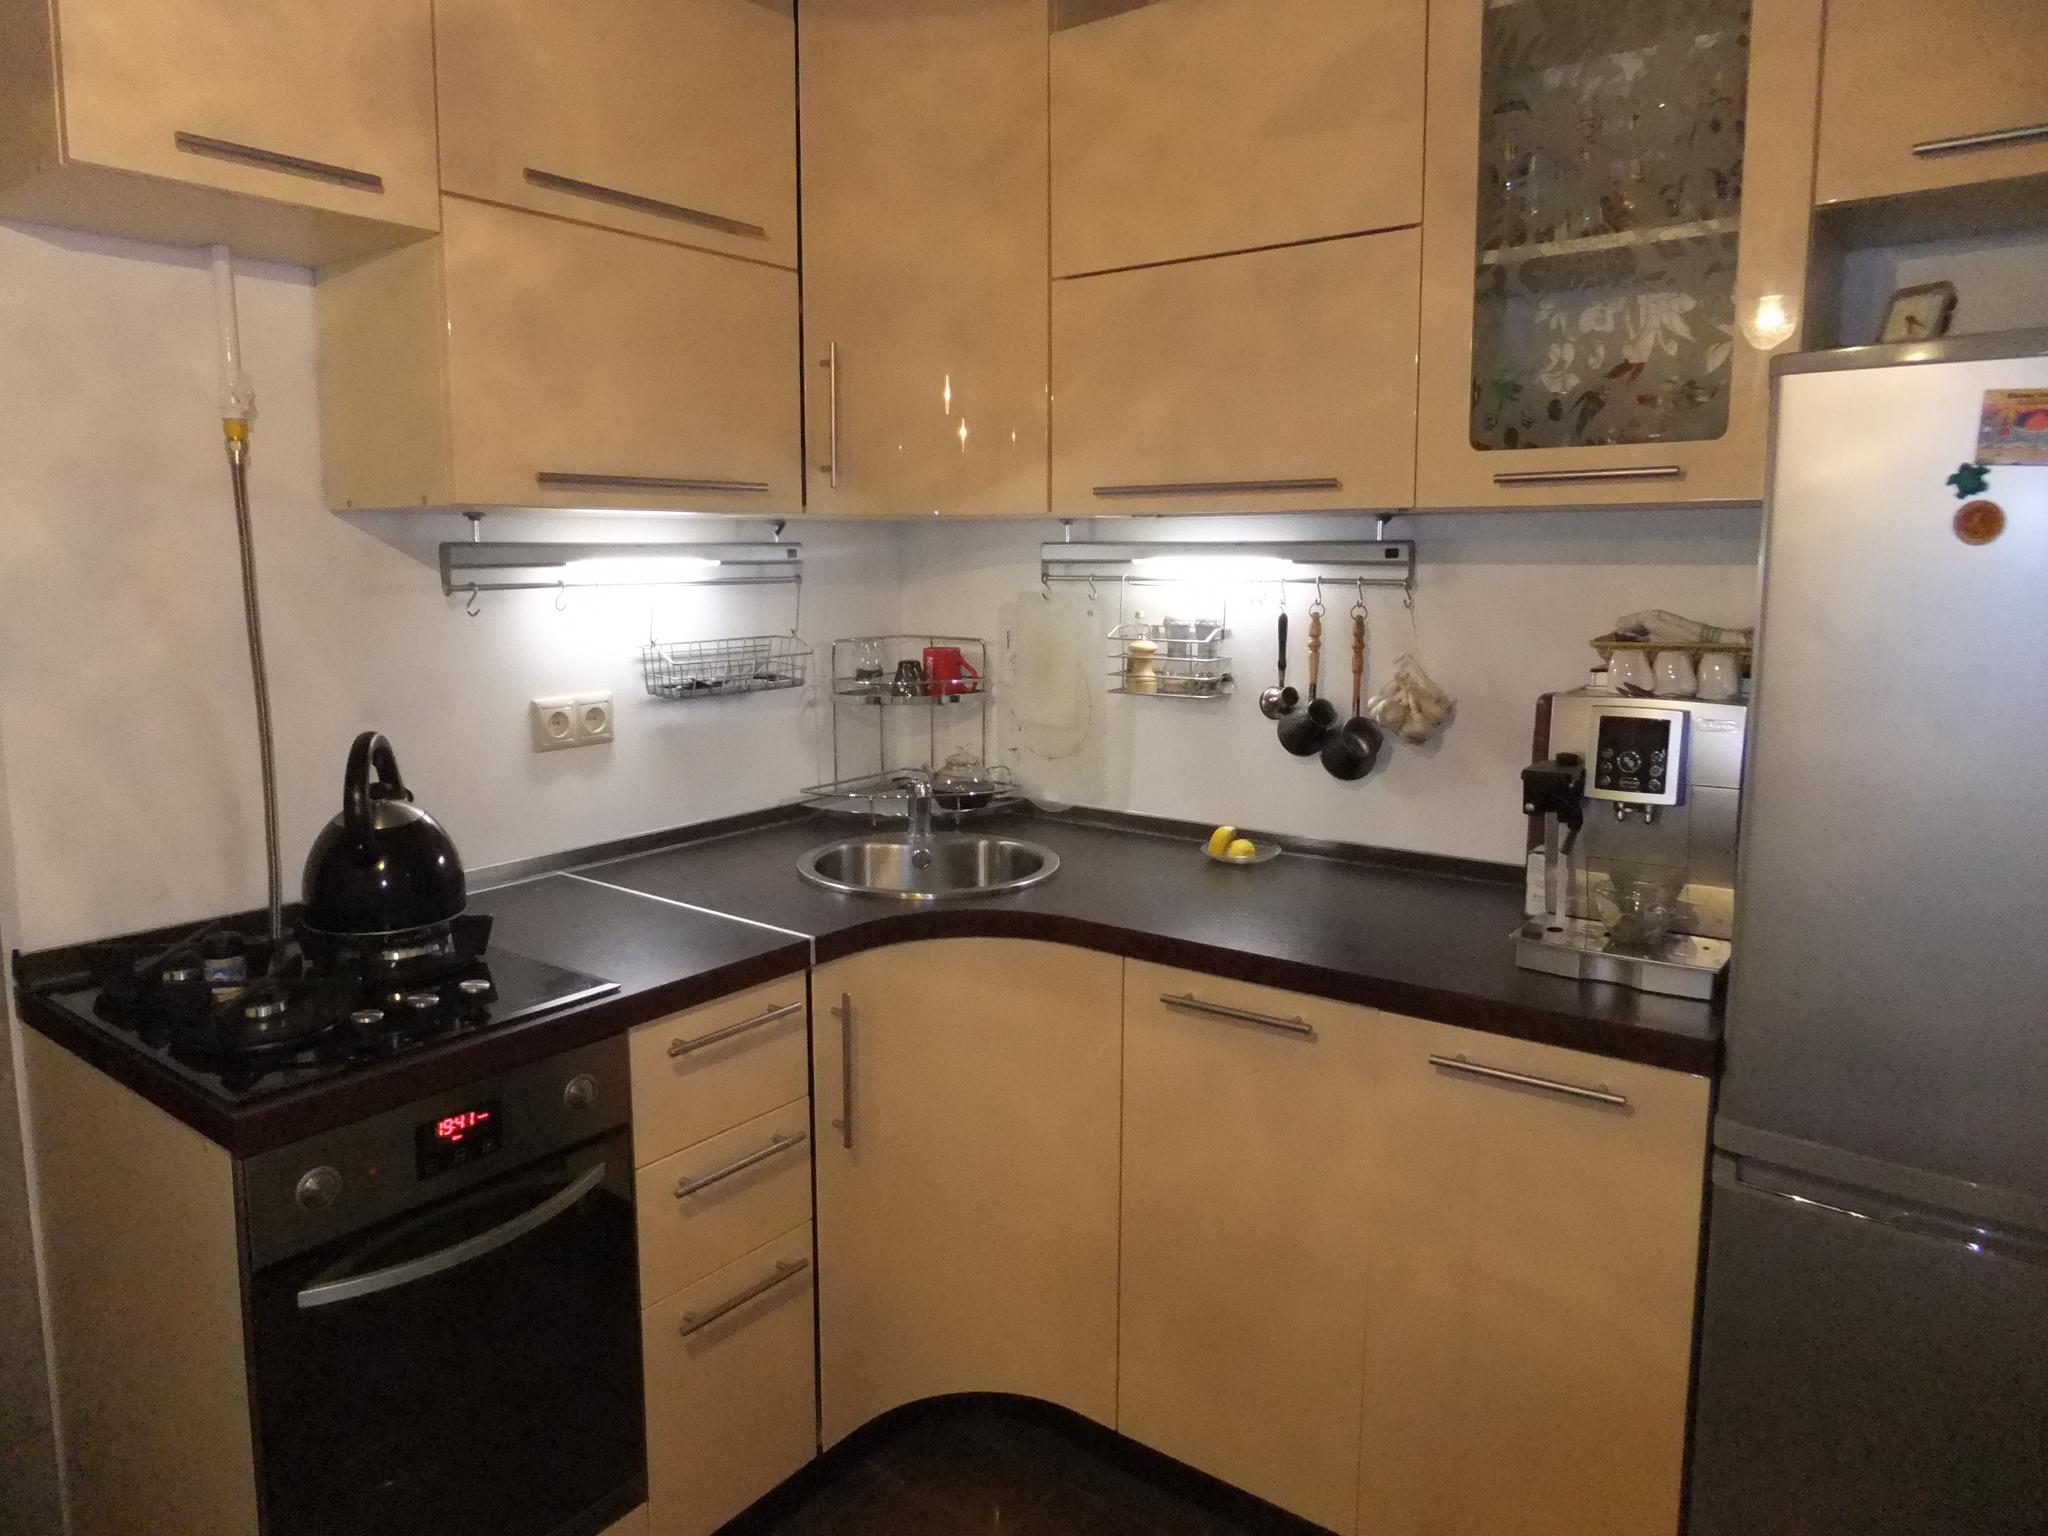 Фото ремонт в кухне 6 метров